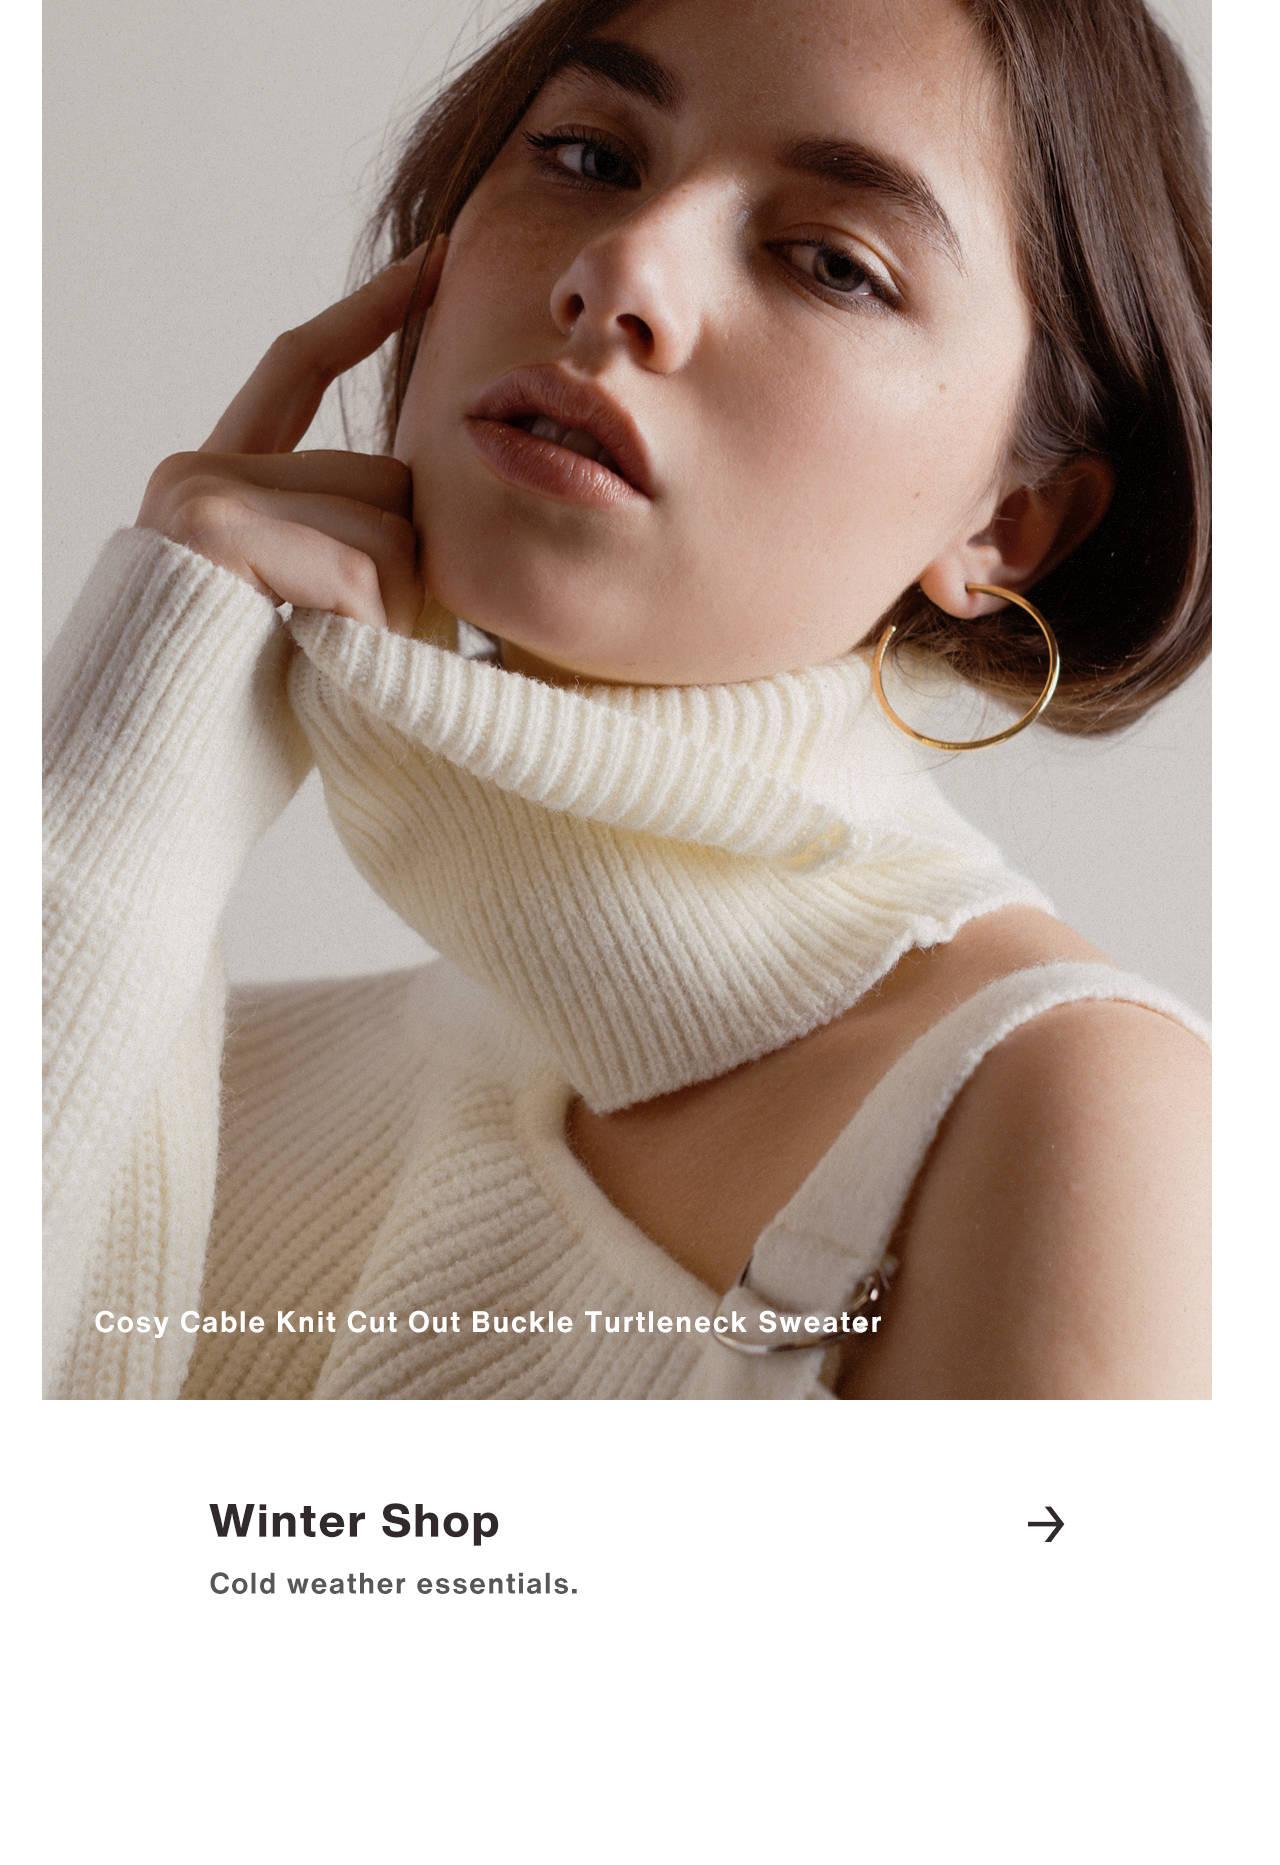 Winter Shop - Cold weather essentials.